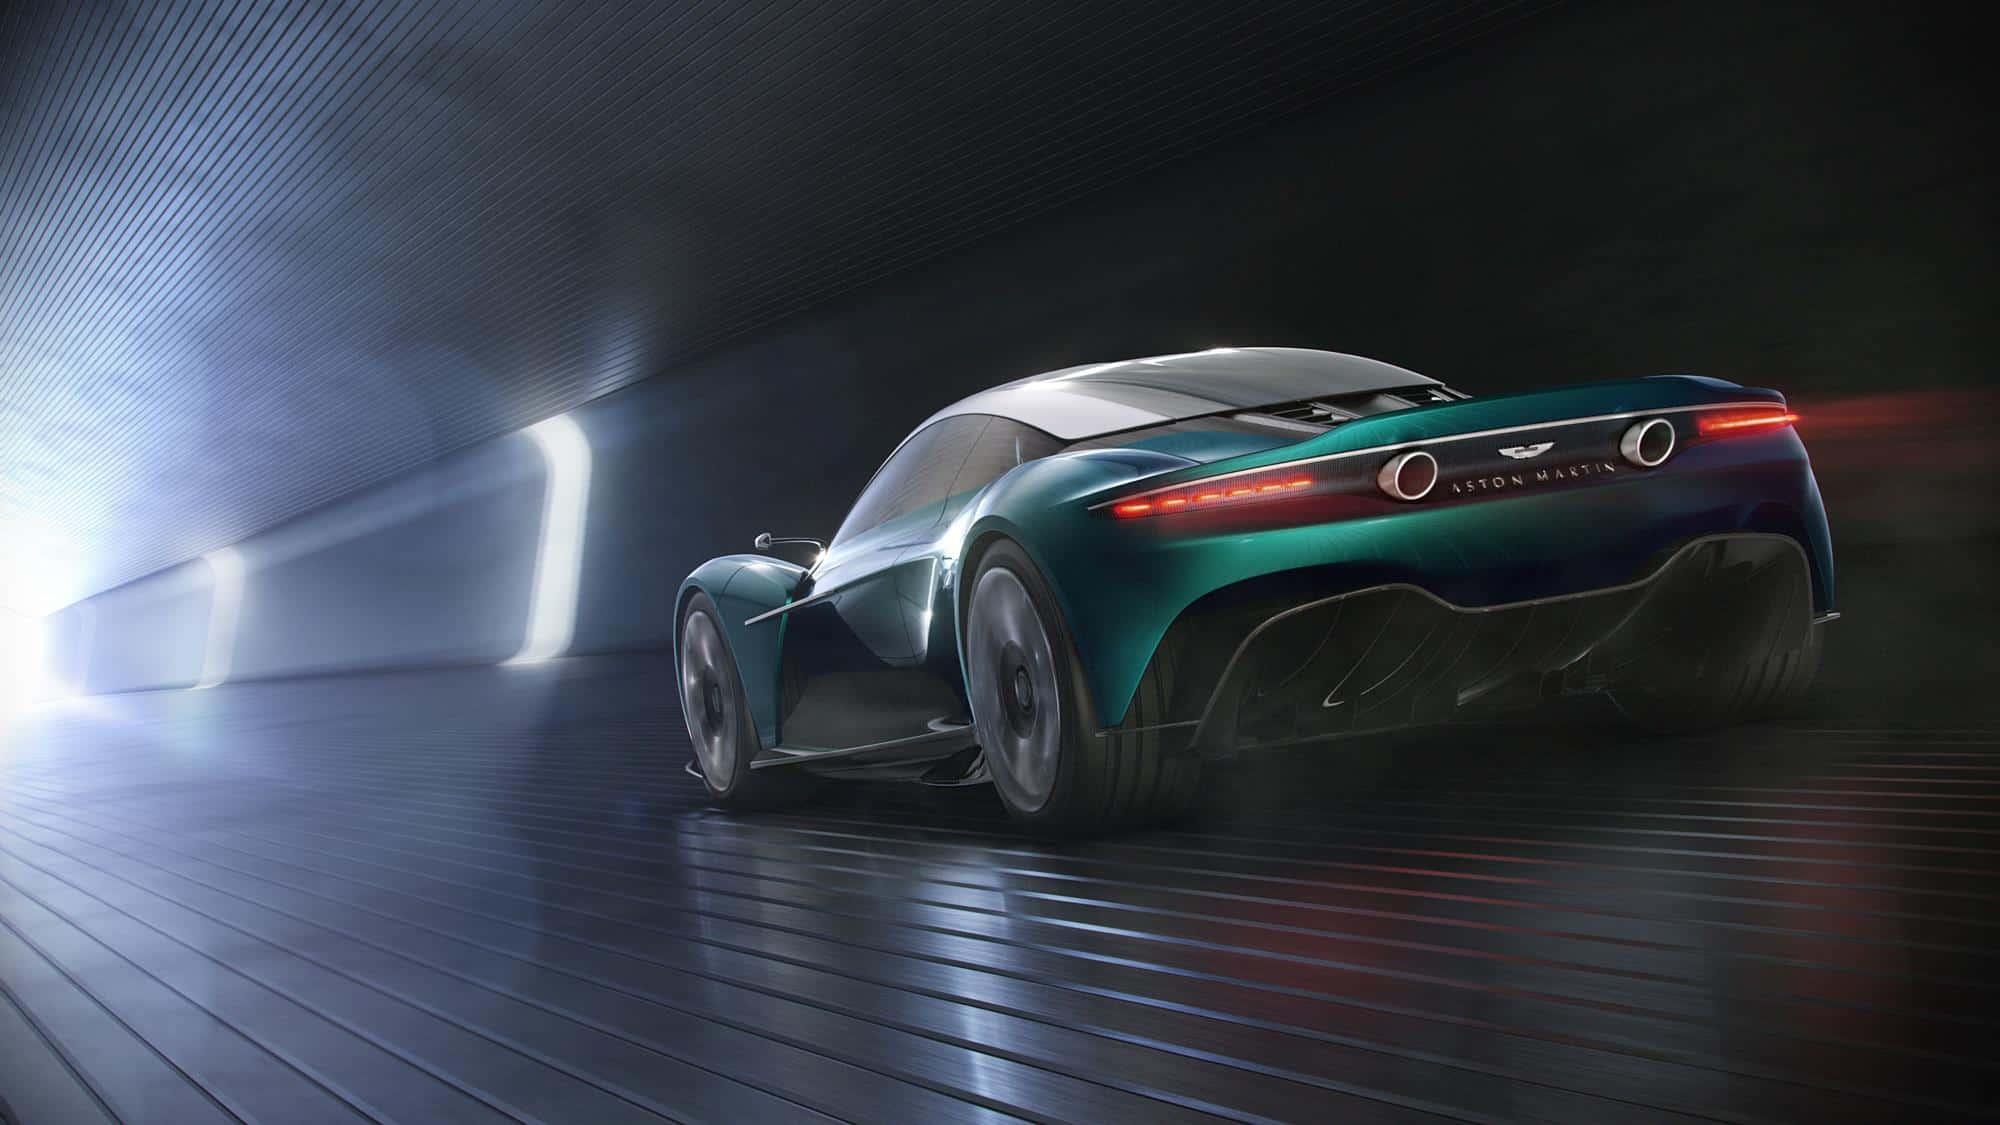 Aston Martin Vanquish Vision Concept 8